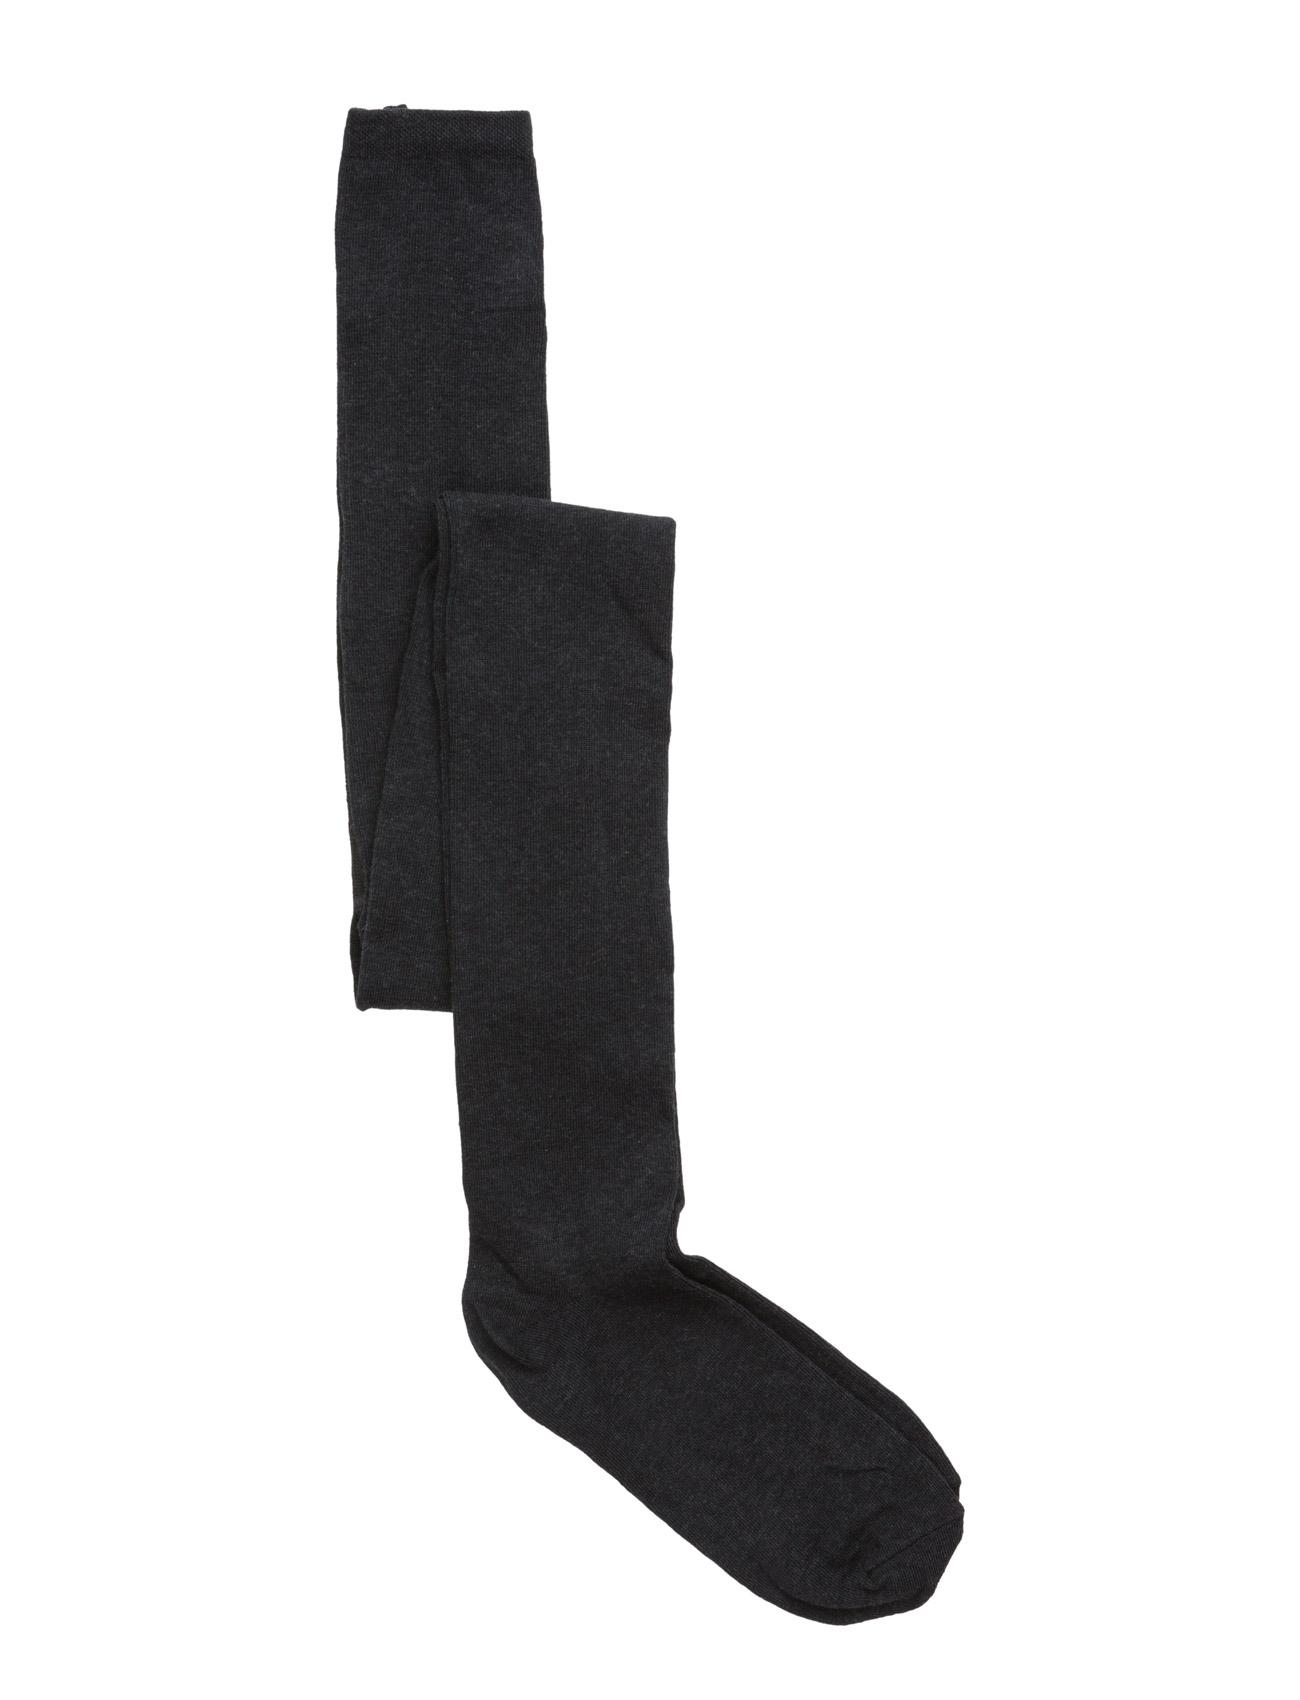 Image of Tight, Plain Colour Girls Socks & Tights Tights Grå MELTON (2421160399)